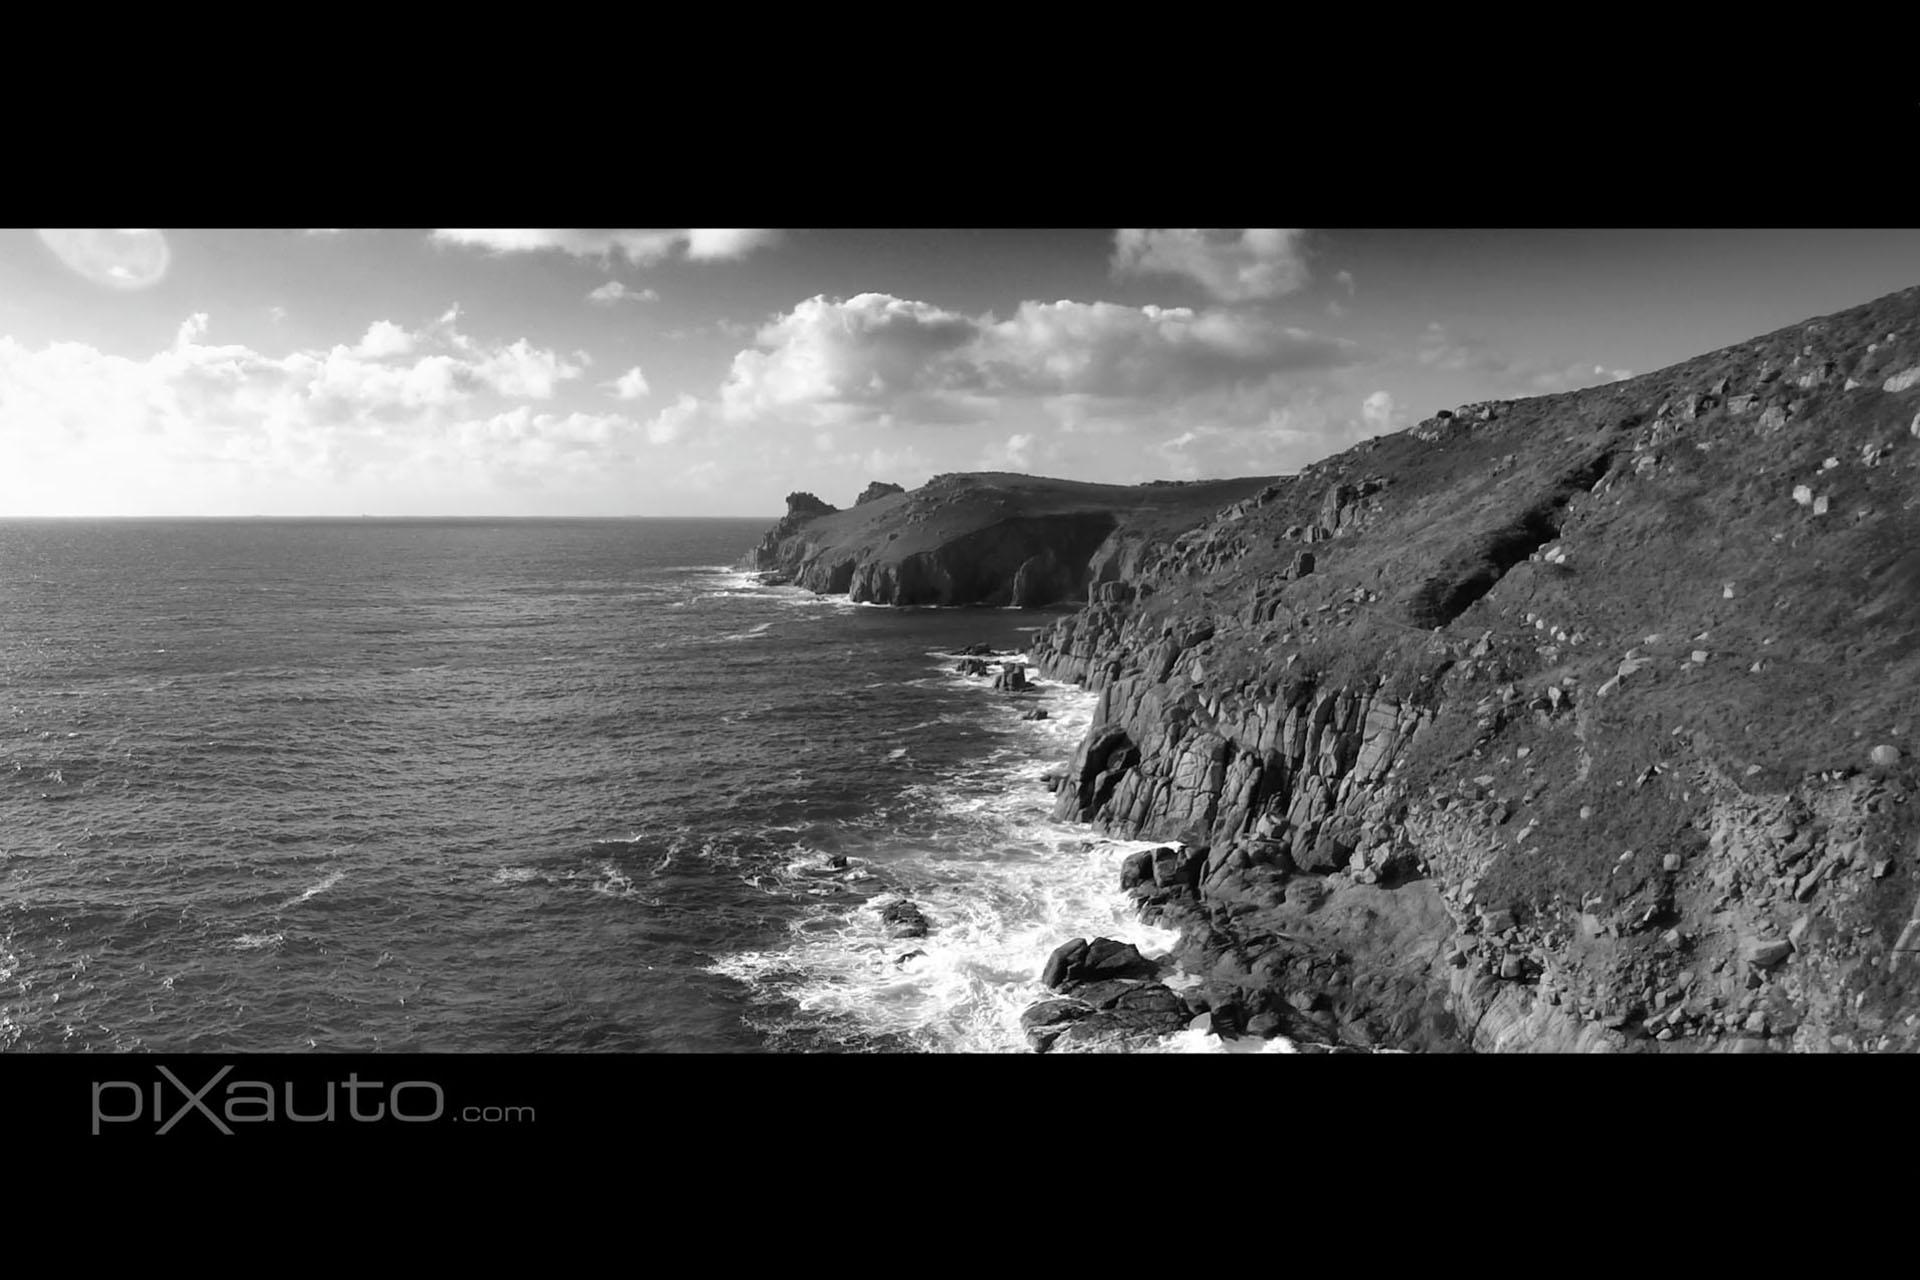 Lands End Cliffs aerial photo